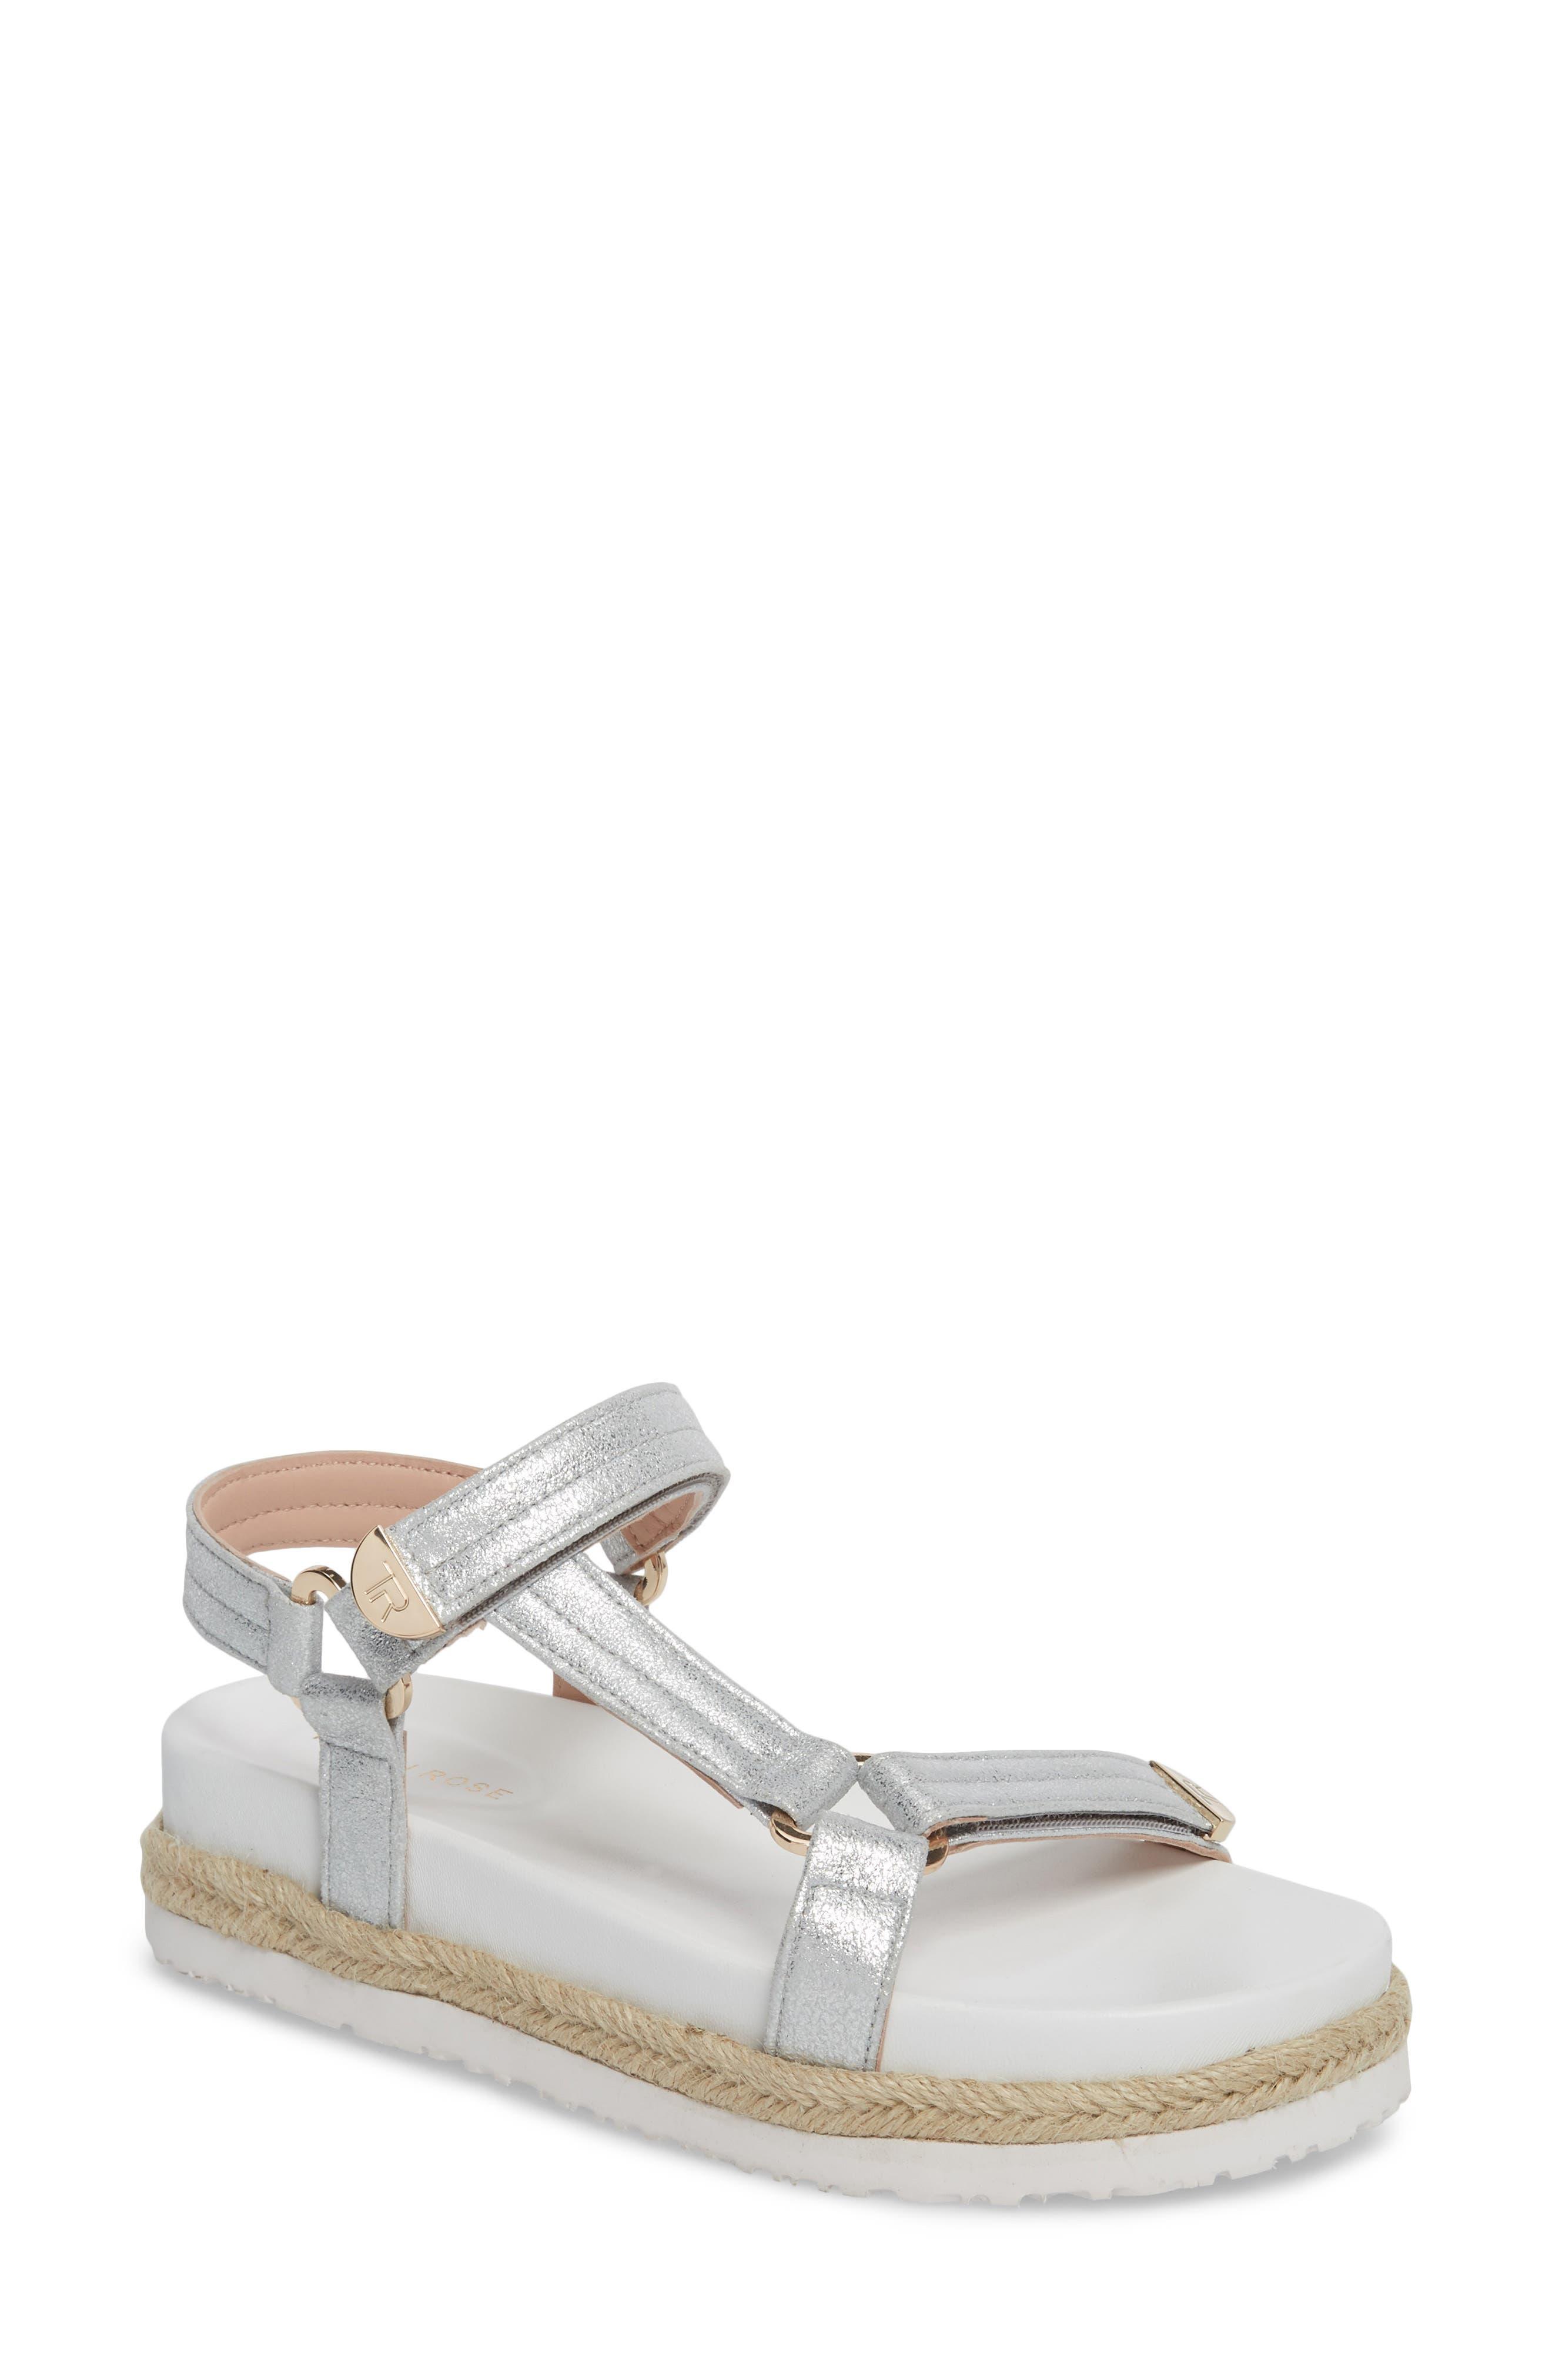 Lydia Platform Sport Sandal,                             Main thumbnail 1, color,                             Silver Leather